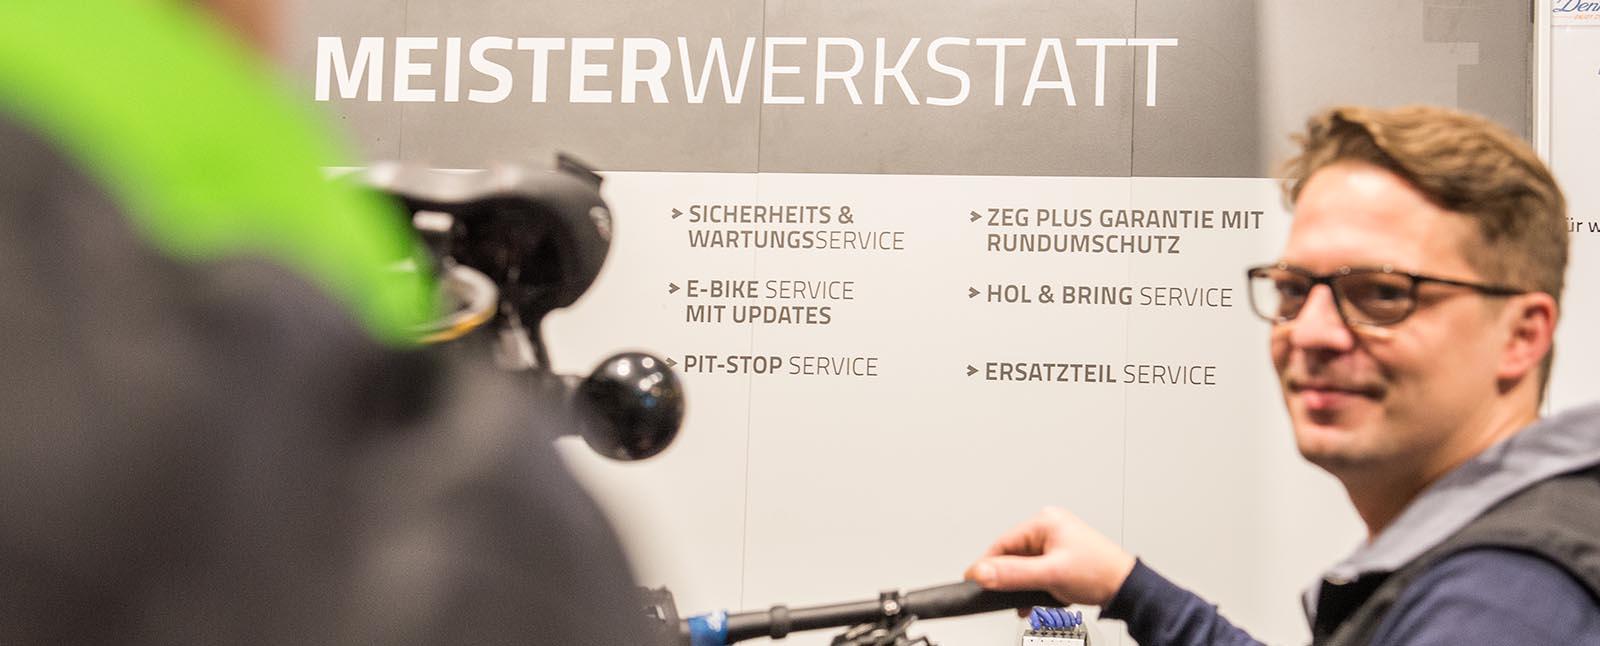 Fahrrad Denfeld Radsport GmbH Meisterwerkstatt Werkstatt Termin